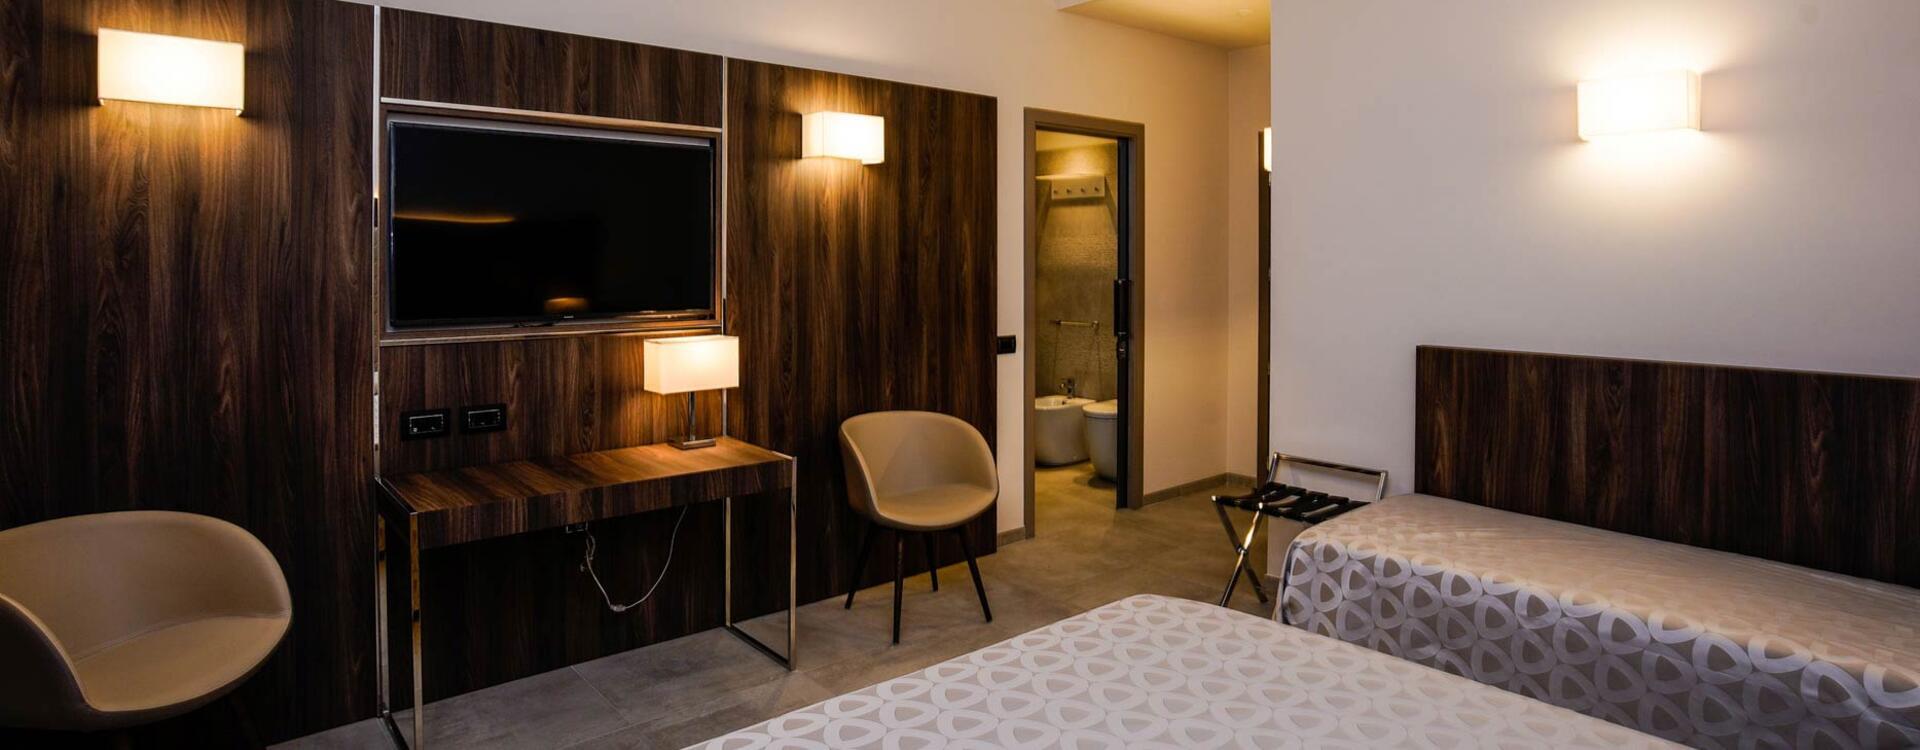 hotelkuma it home 004